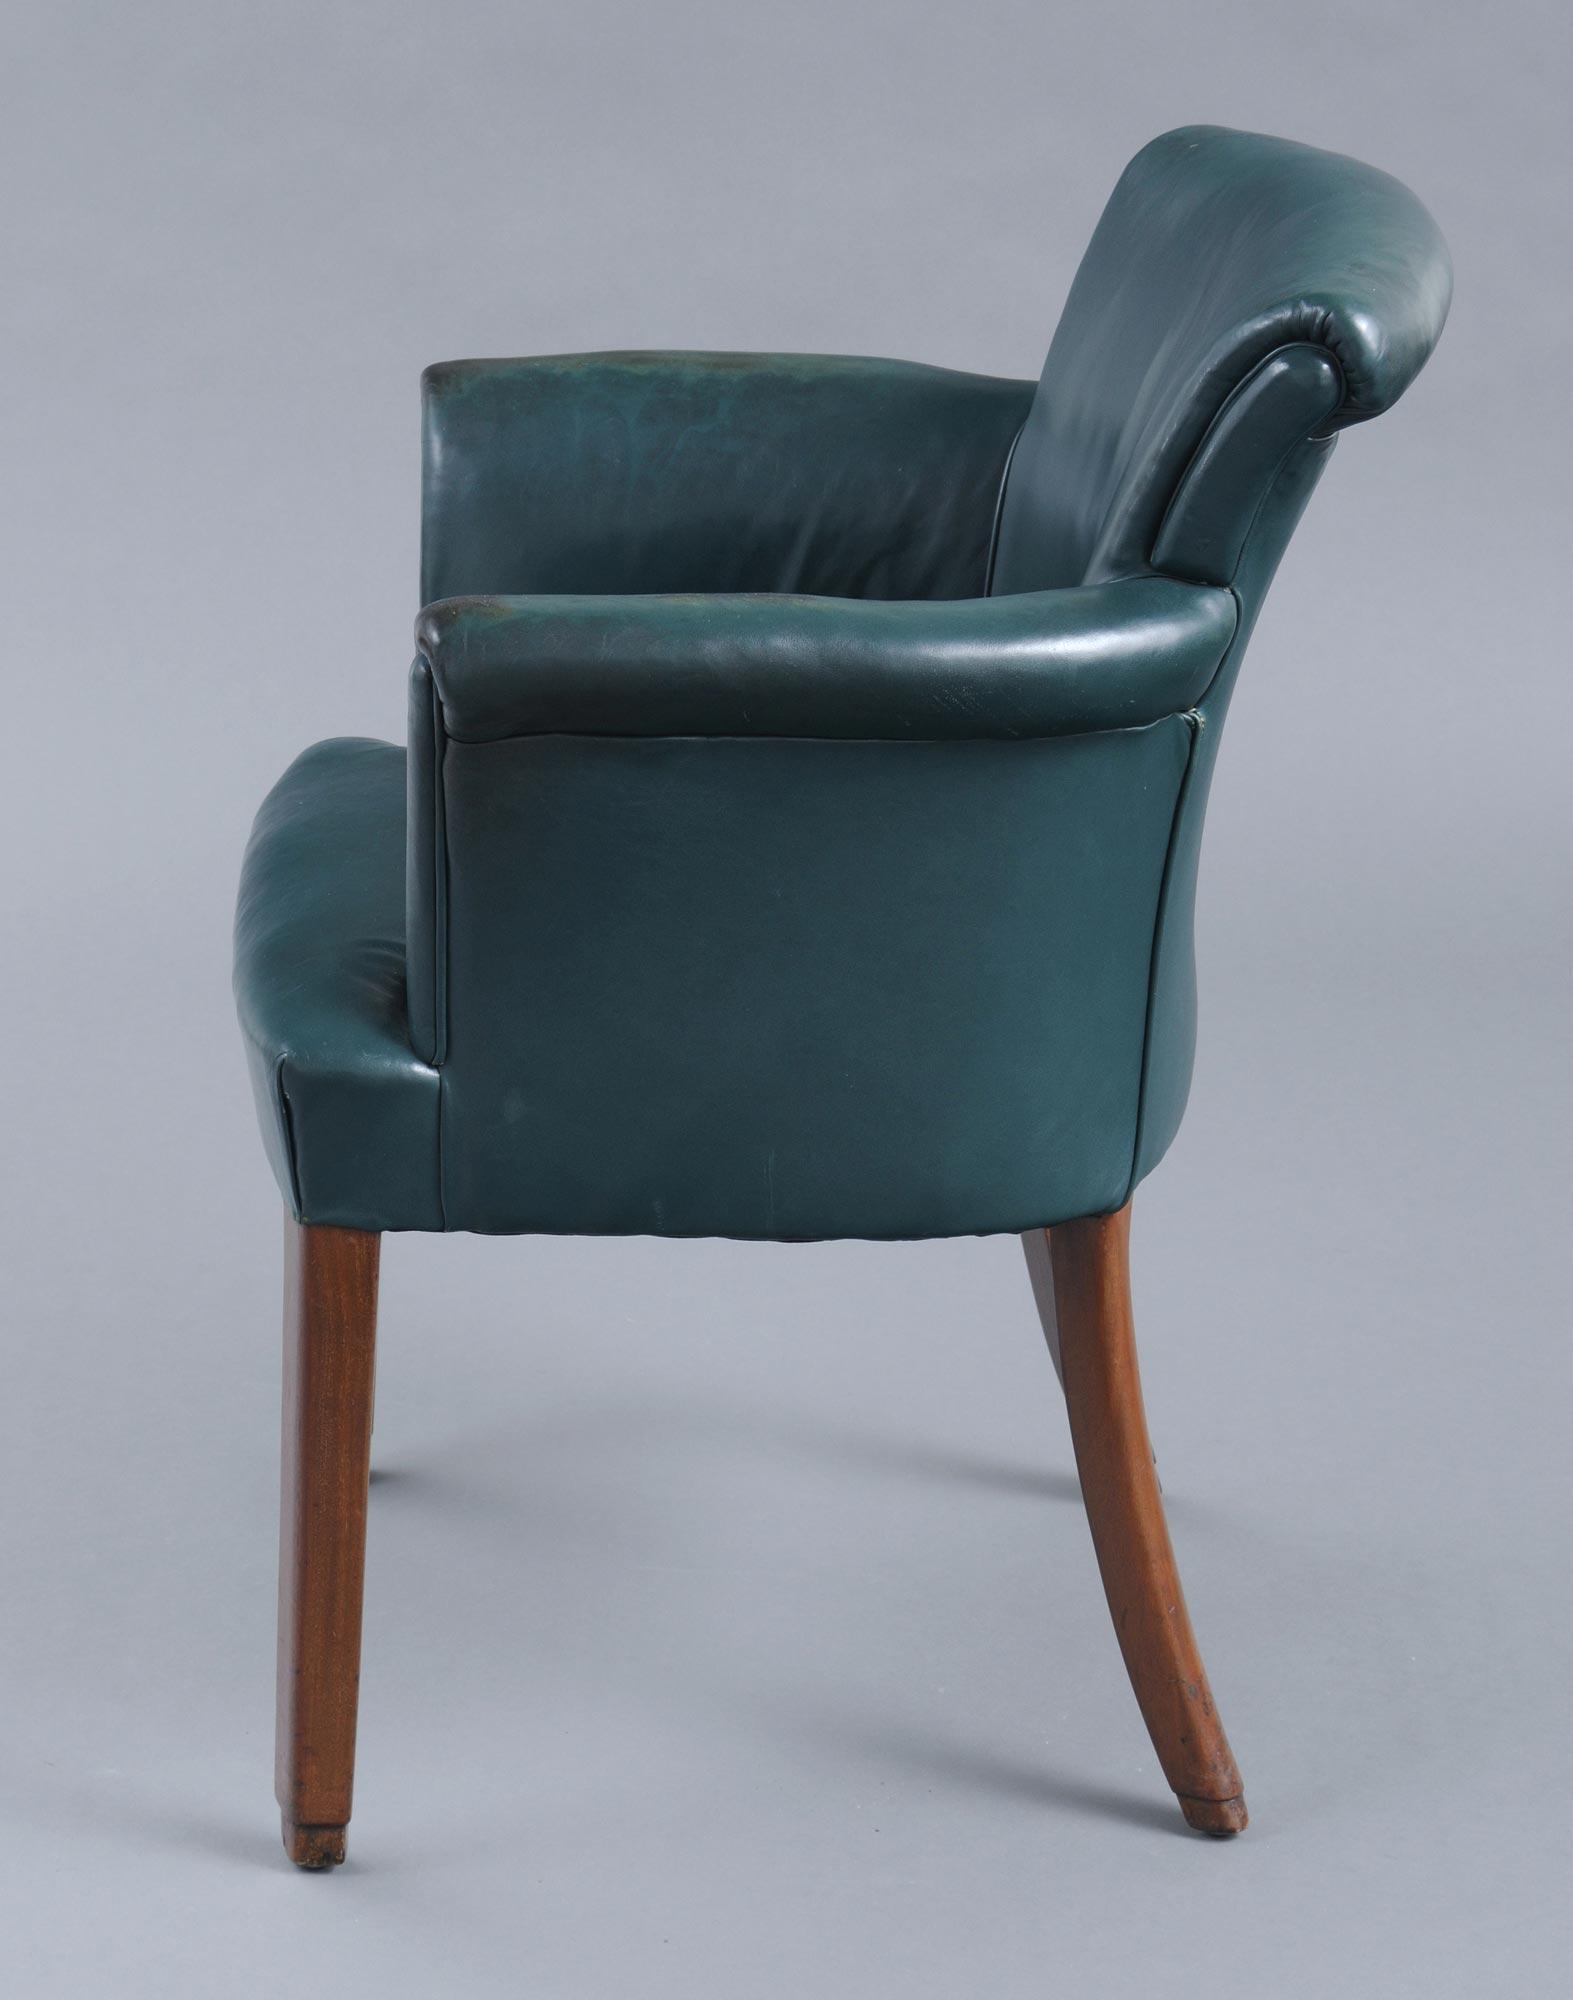 English Antique Art Deco Gany Leather Desk Chair